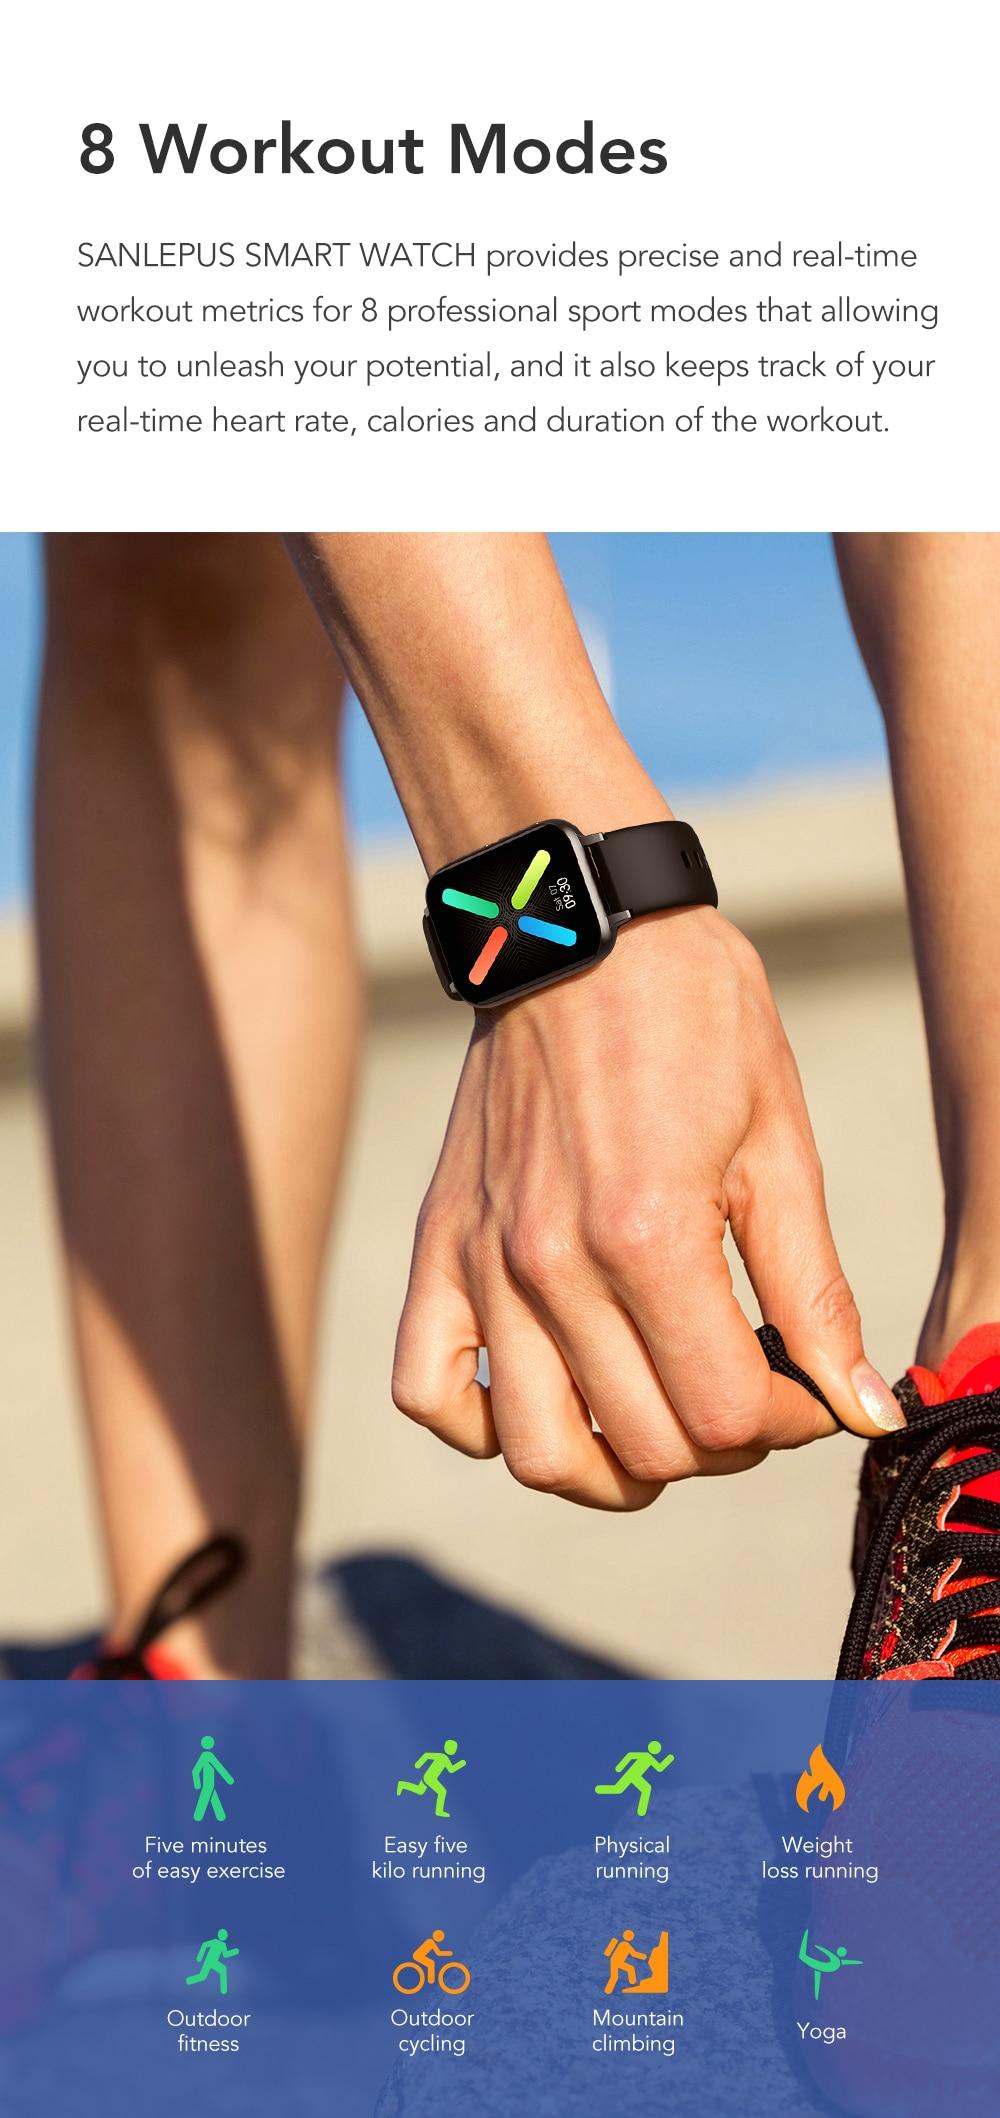 Hc91e31c76a4f4aefb0da0195c36895ccV SANLEPUS 2021 NEW Dial Calls Smart Watch Men Women Waterproof Smartwatch MP3 Player For OPPO Android Apple Xiaomi Huawei